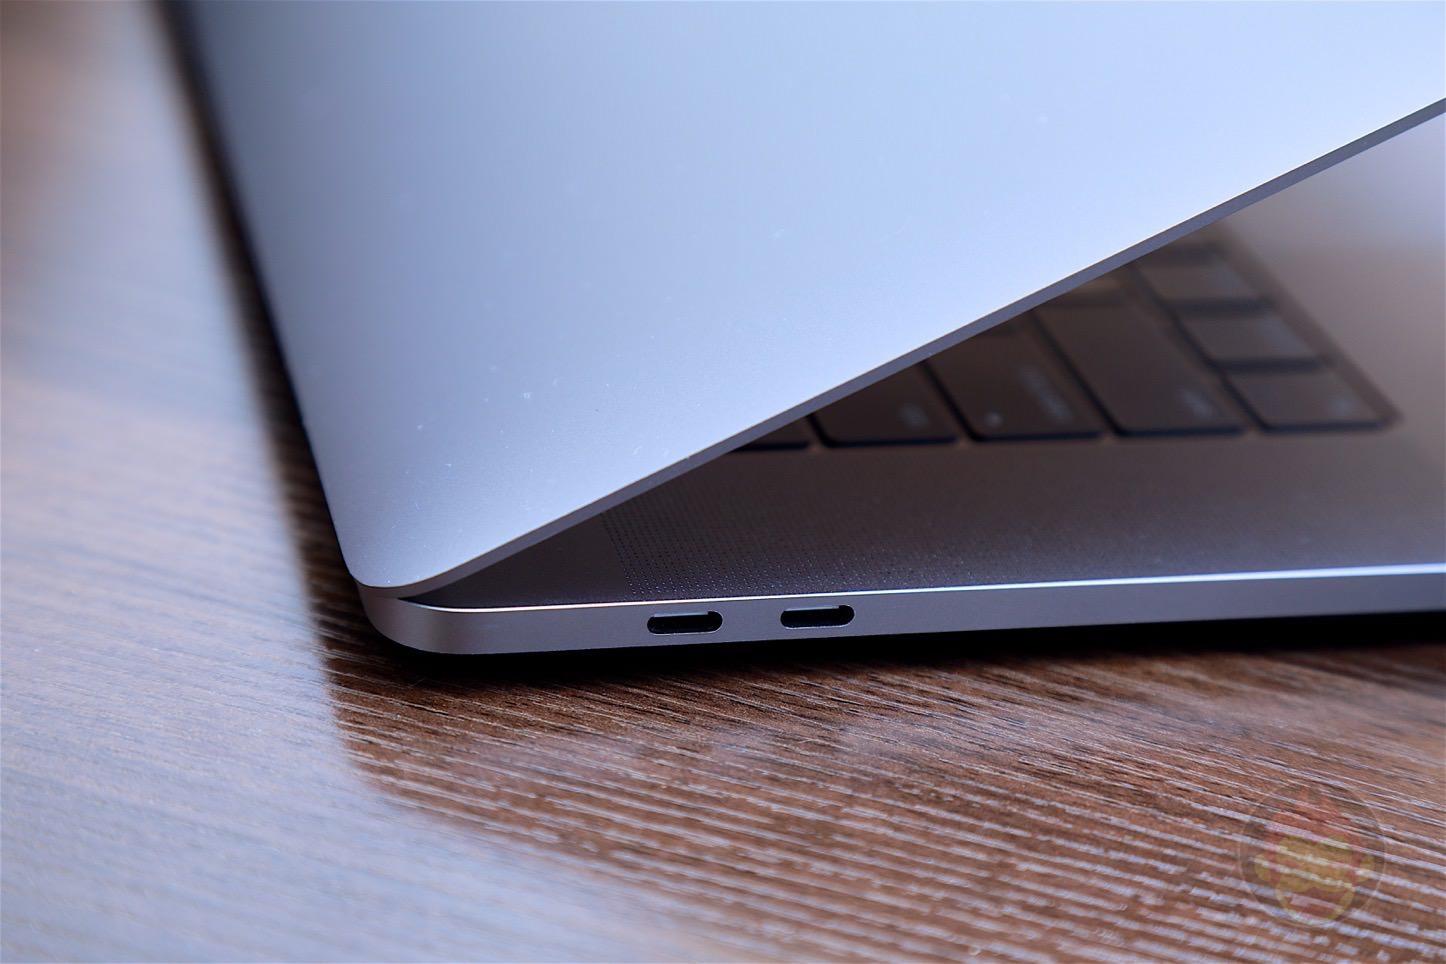 MacBook-Pro-Late-2016-15inch-model-02.jpg